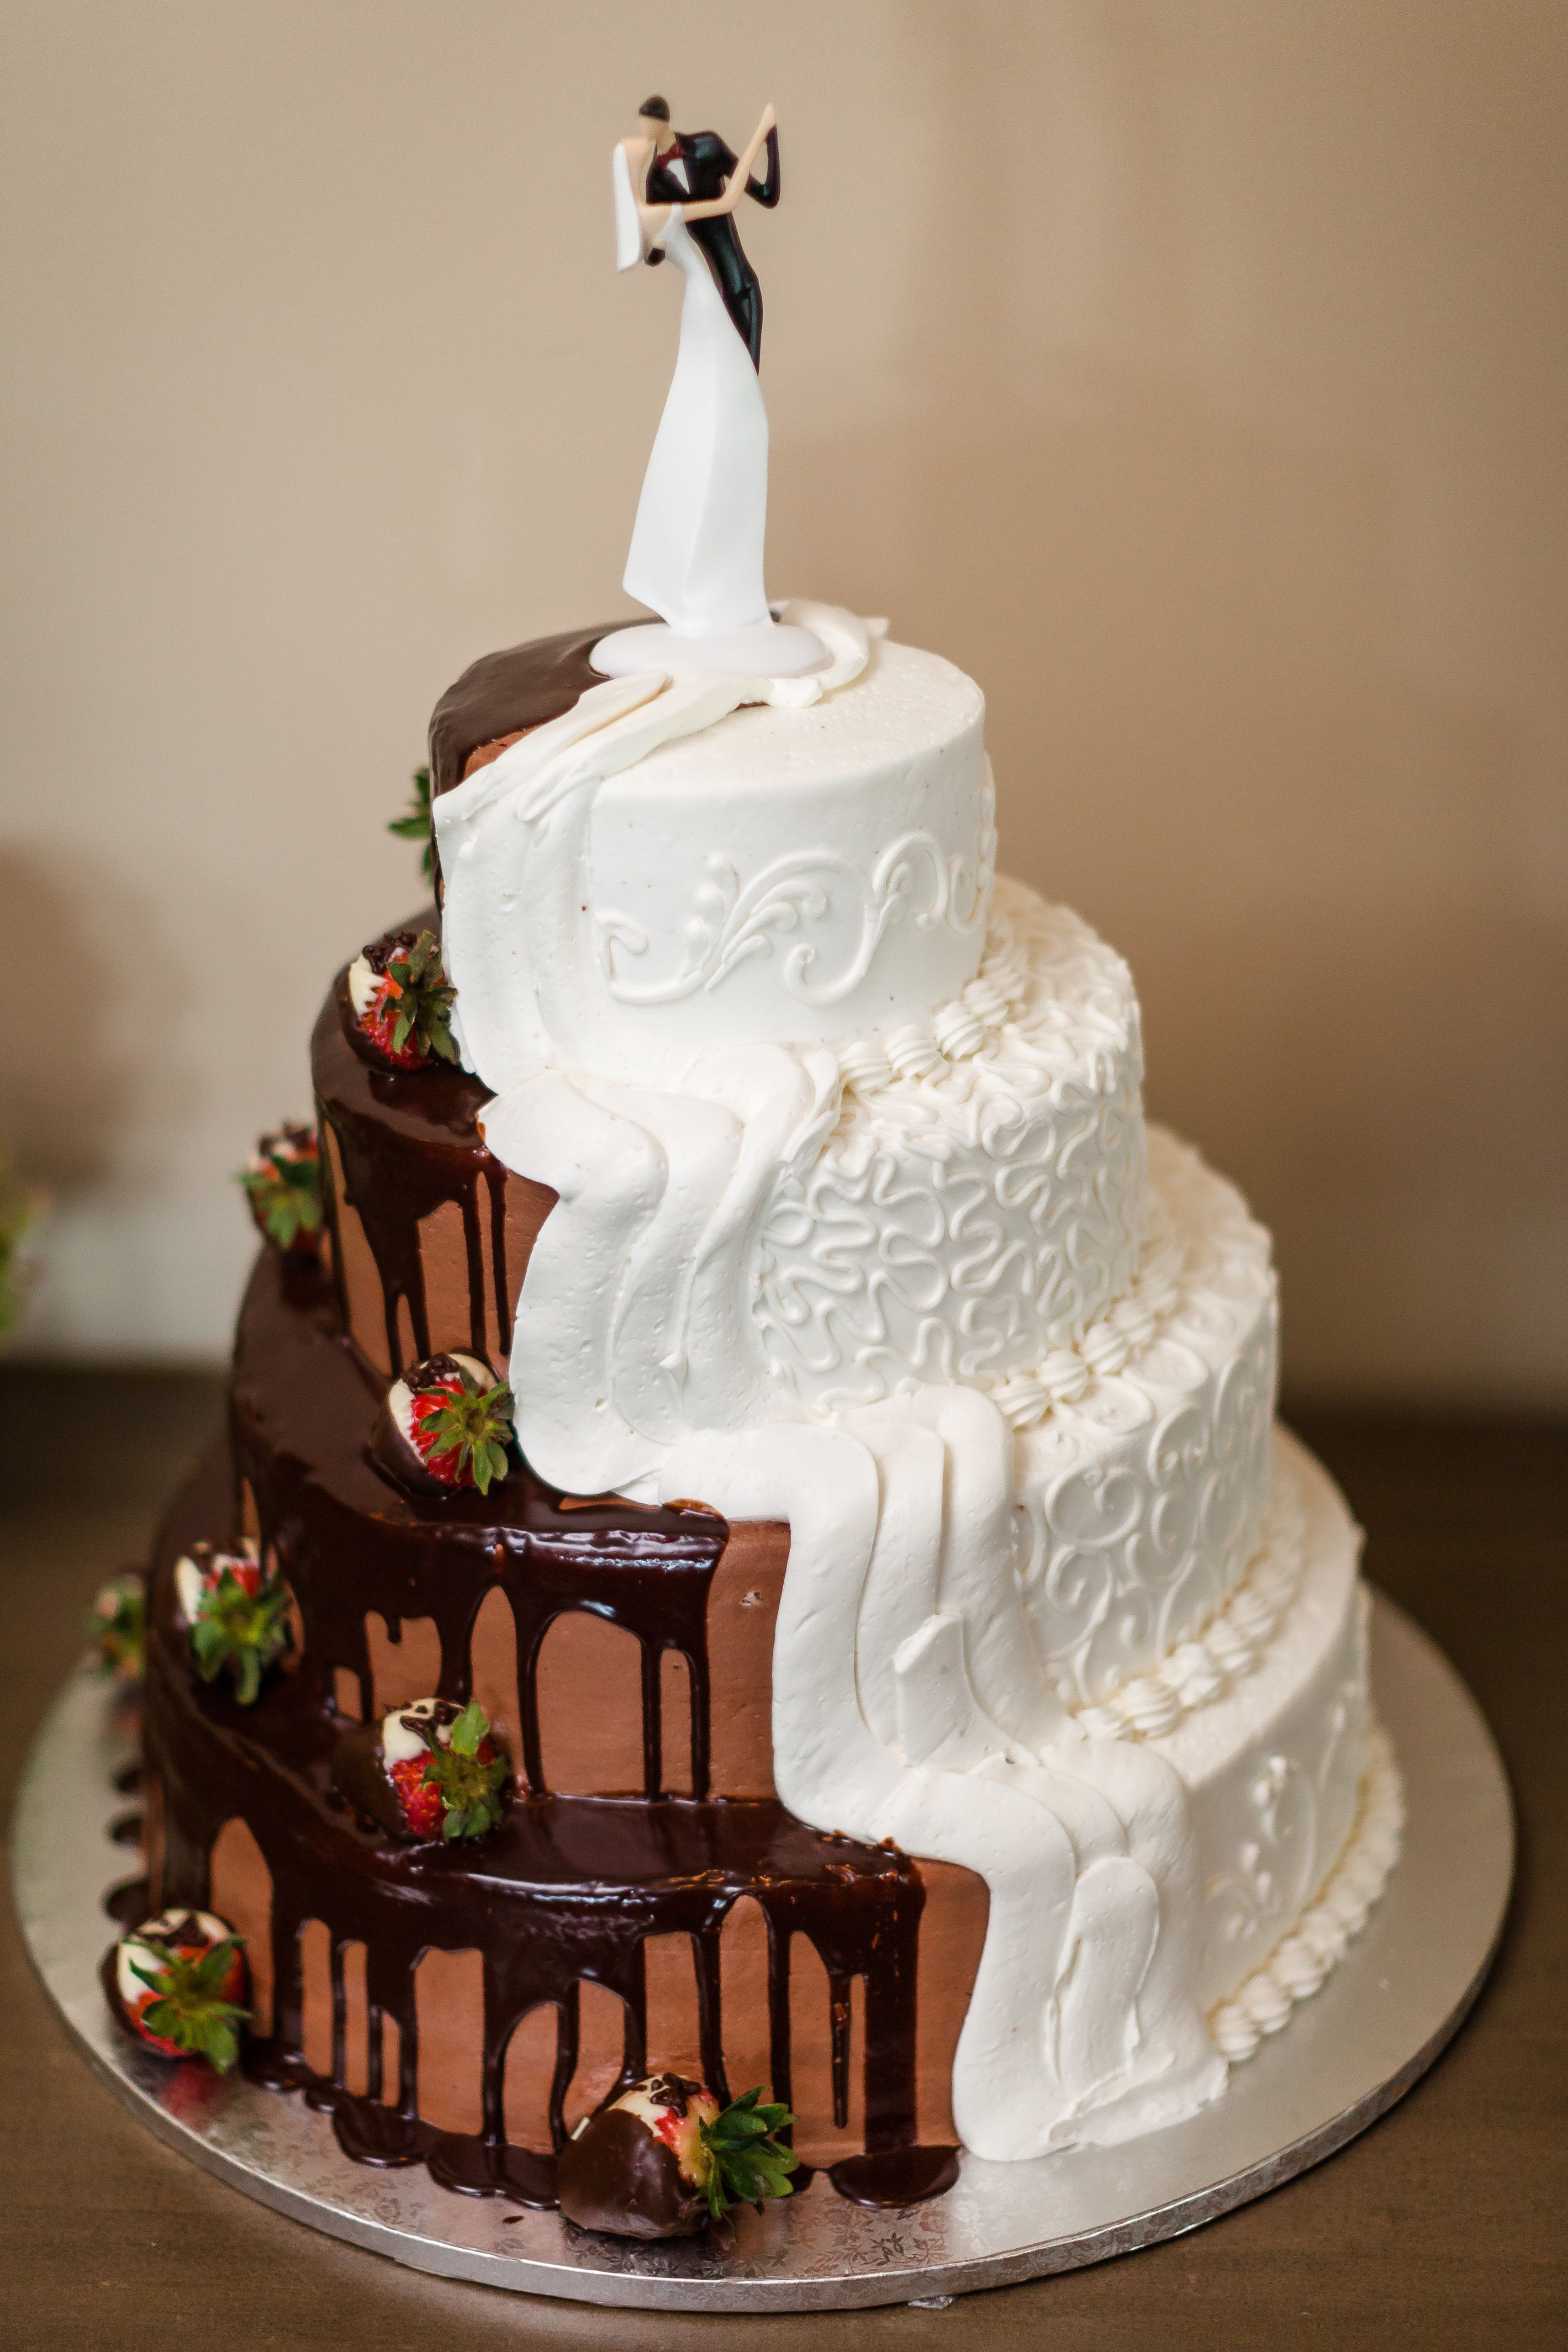 48+ Cake of the month club toronto ideas